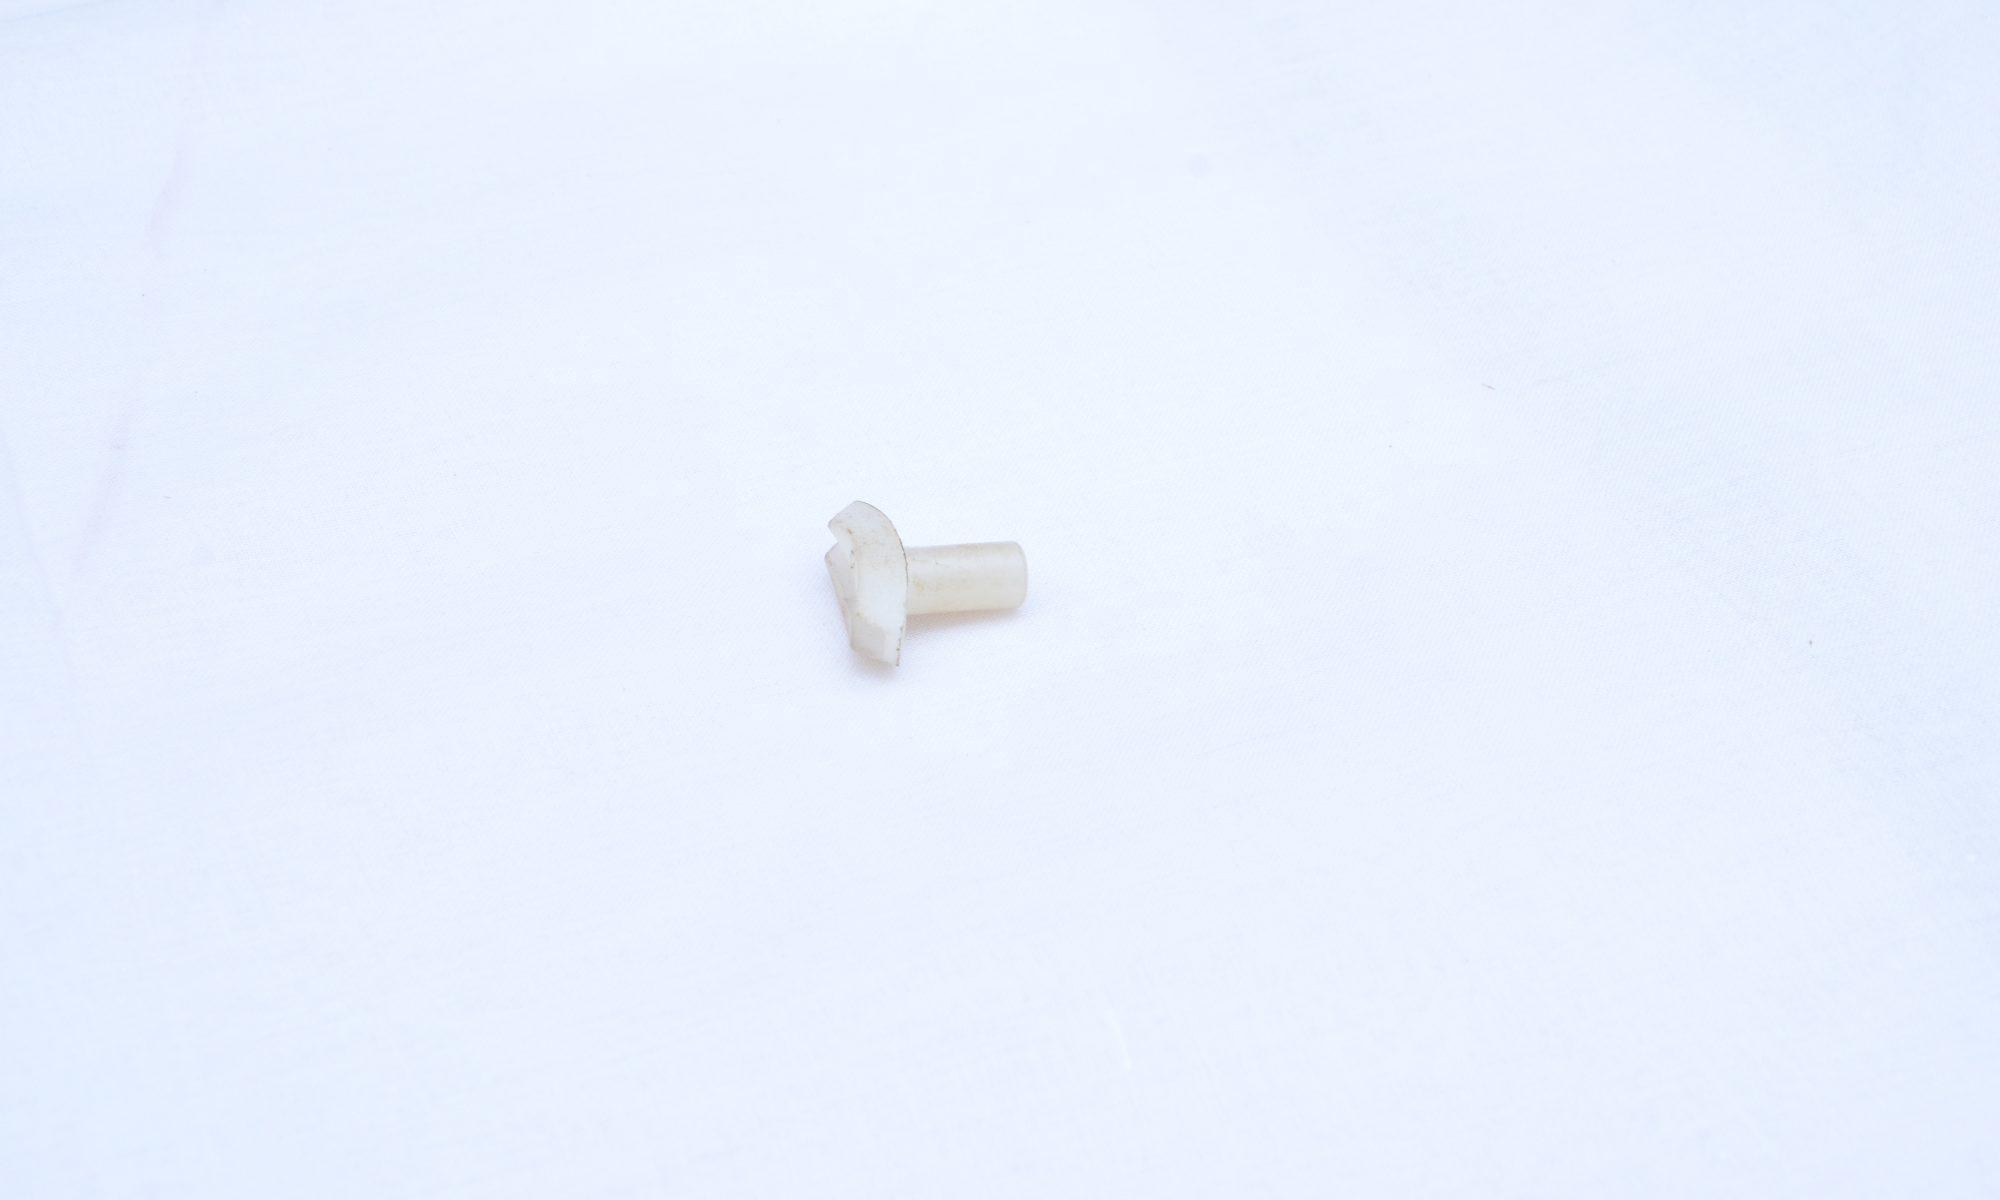 Nylon key for lohia L S 200 cheesh winder